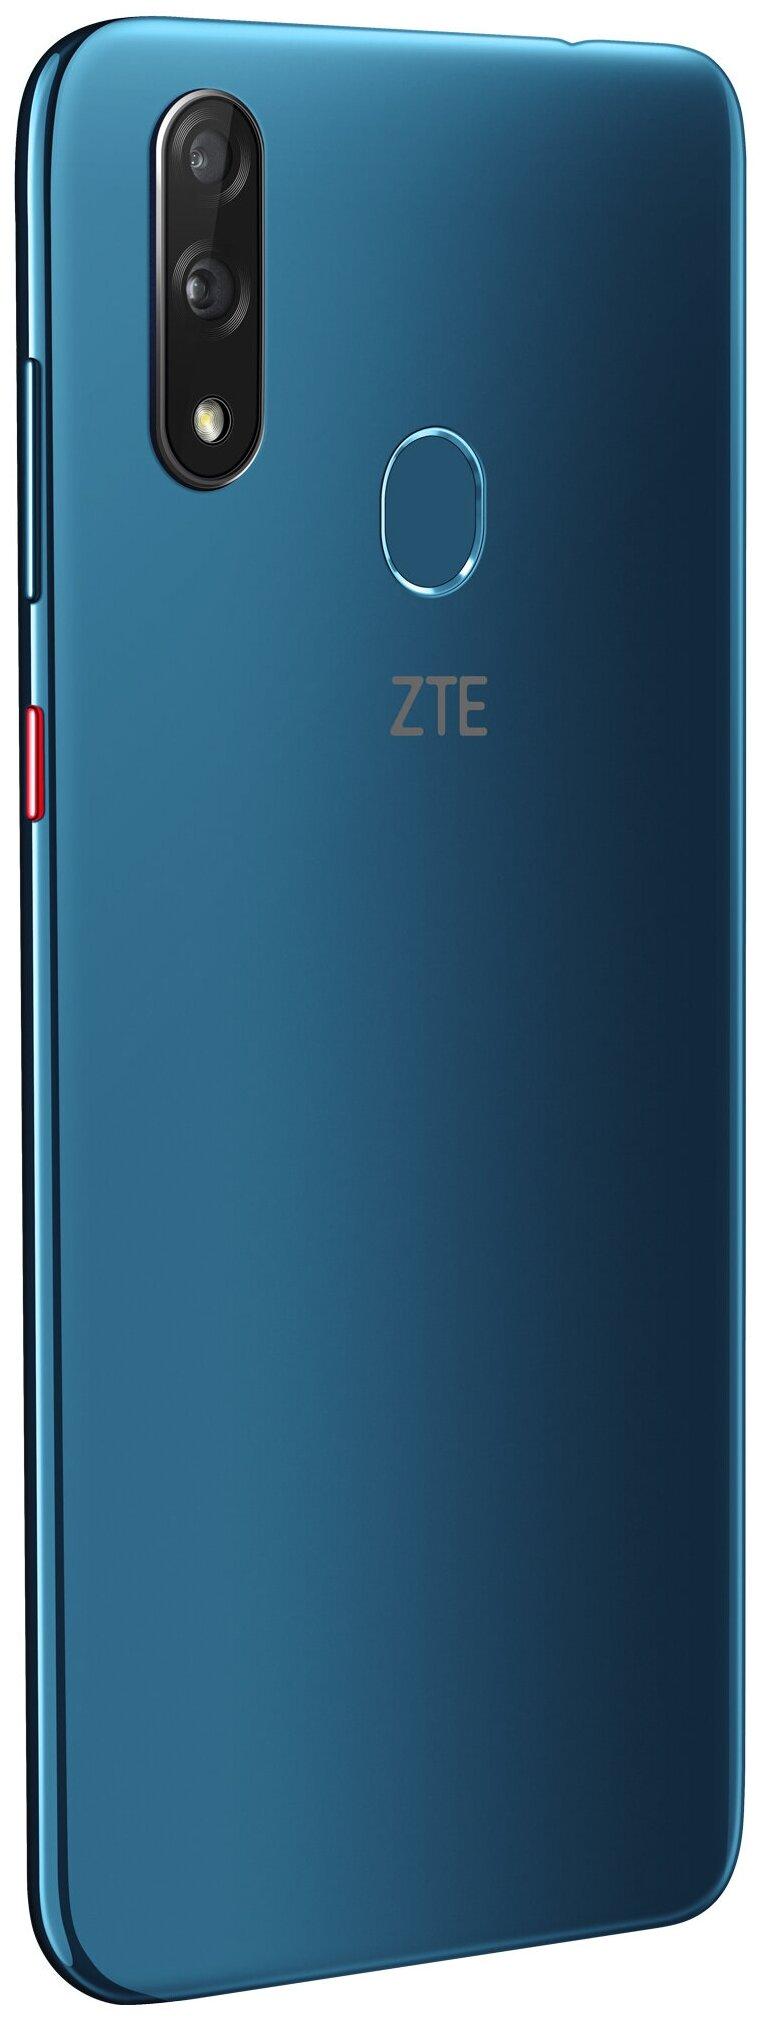 ZTE Blade V10 - беспроводные интерфейсы: NFC, Wi-Fi, Bluetooth 4.2